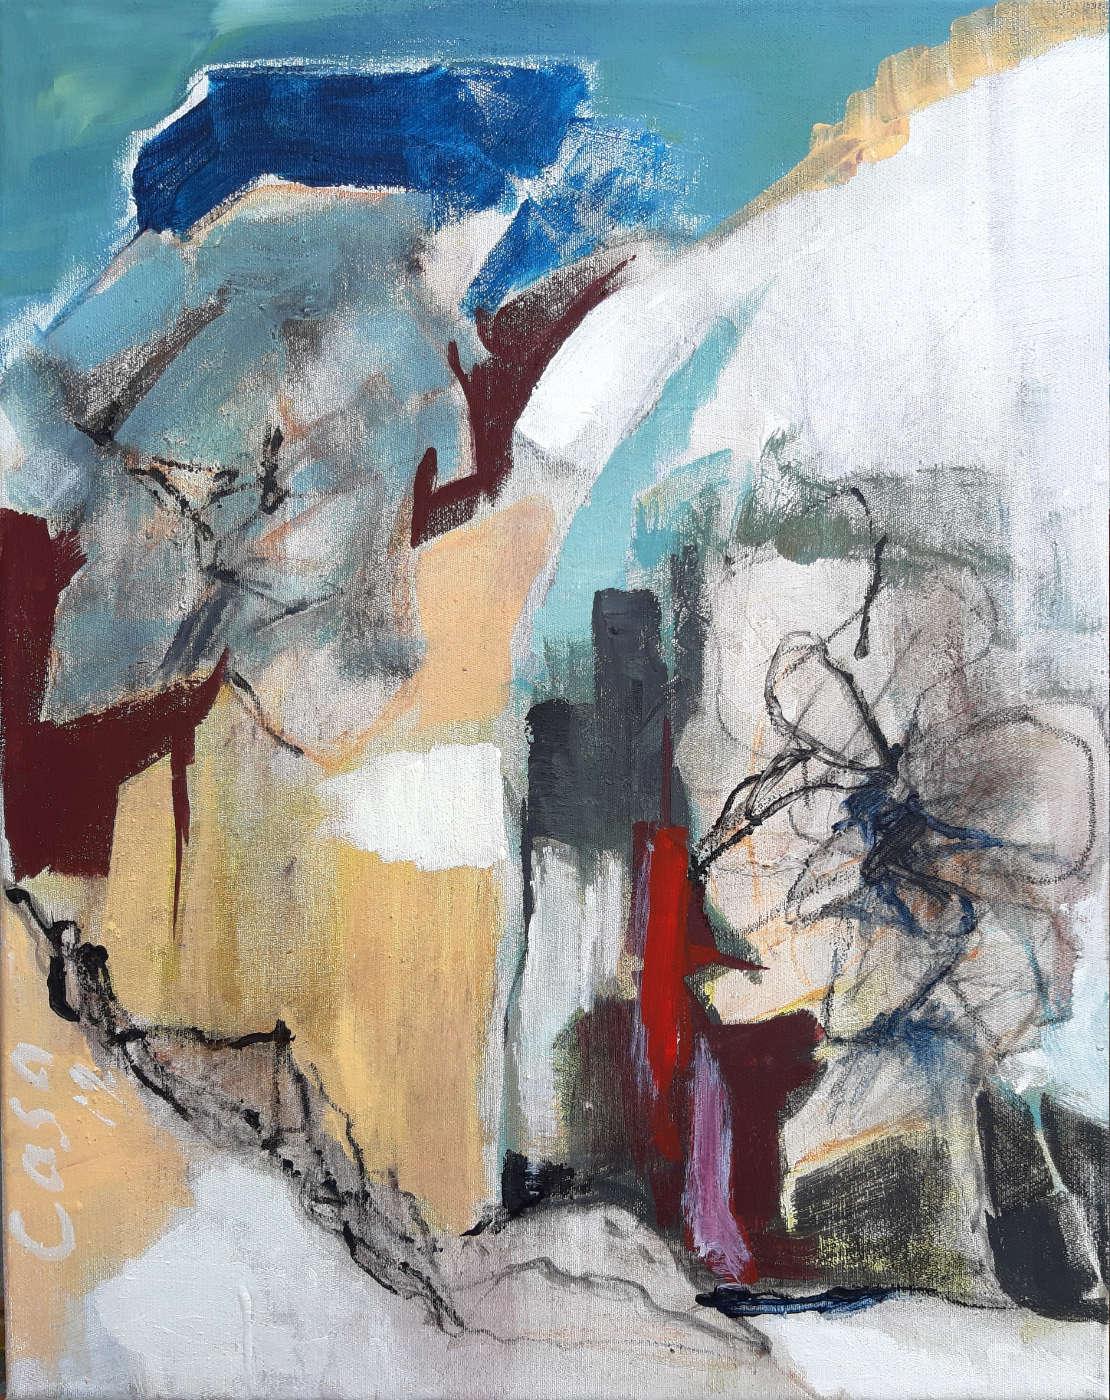 Dialogisch - Acryl, mixed media auf Leinwand, 50 x 40 cm